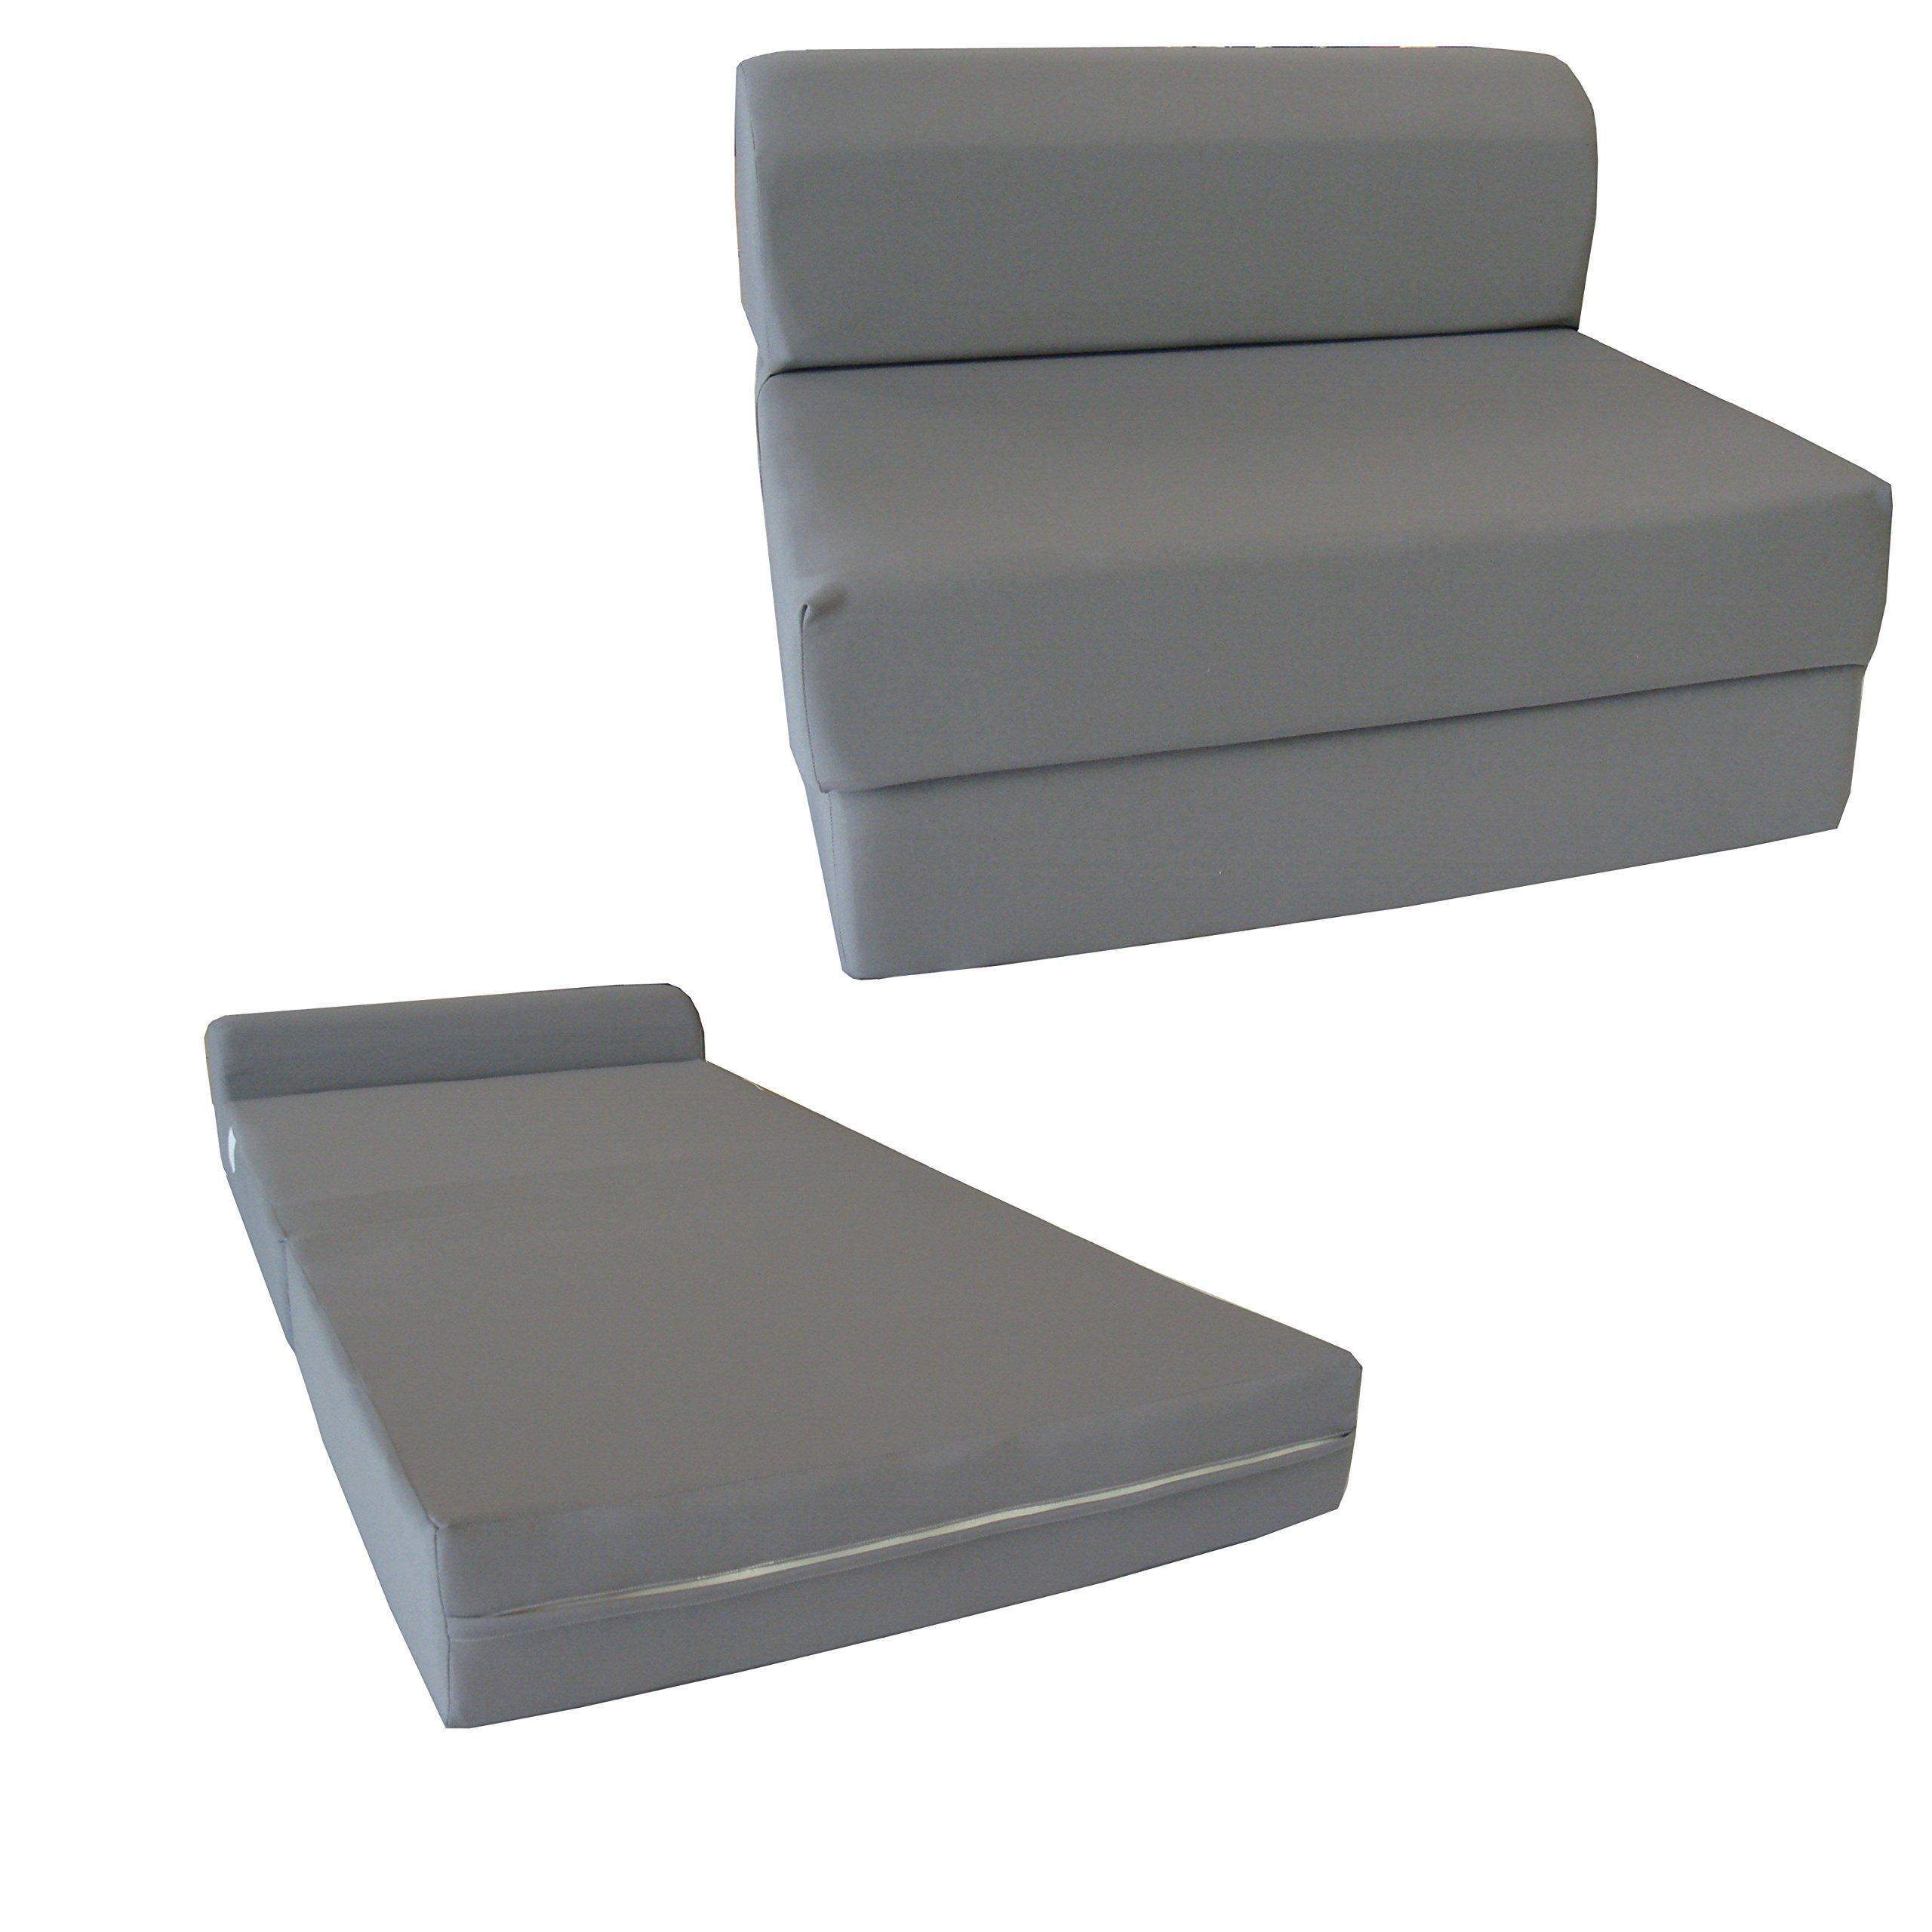 Fold Out Cushion Chairs Chair Pads Amp Cushions